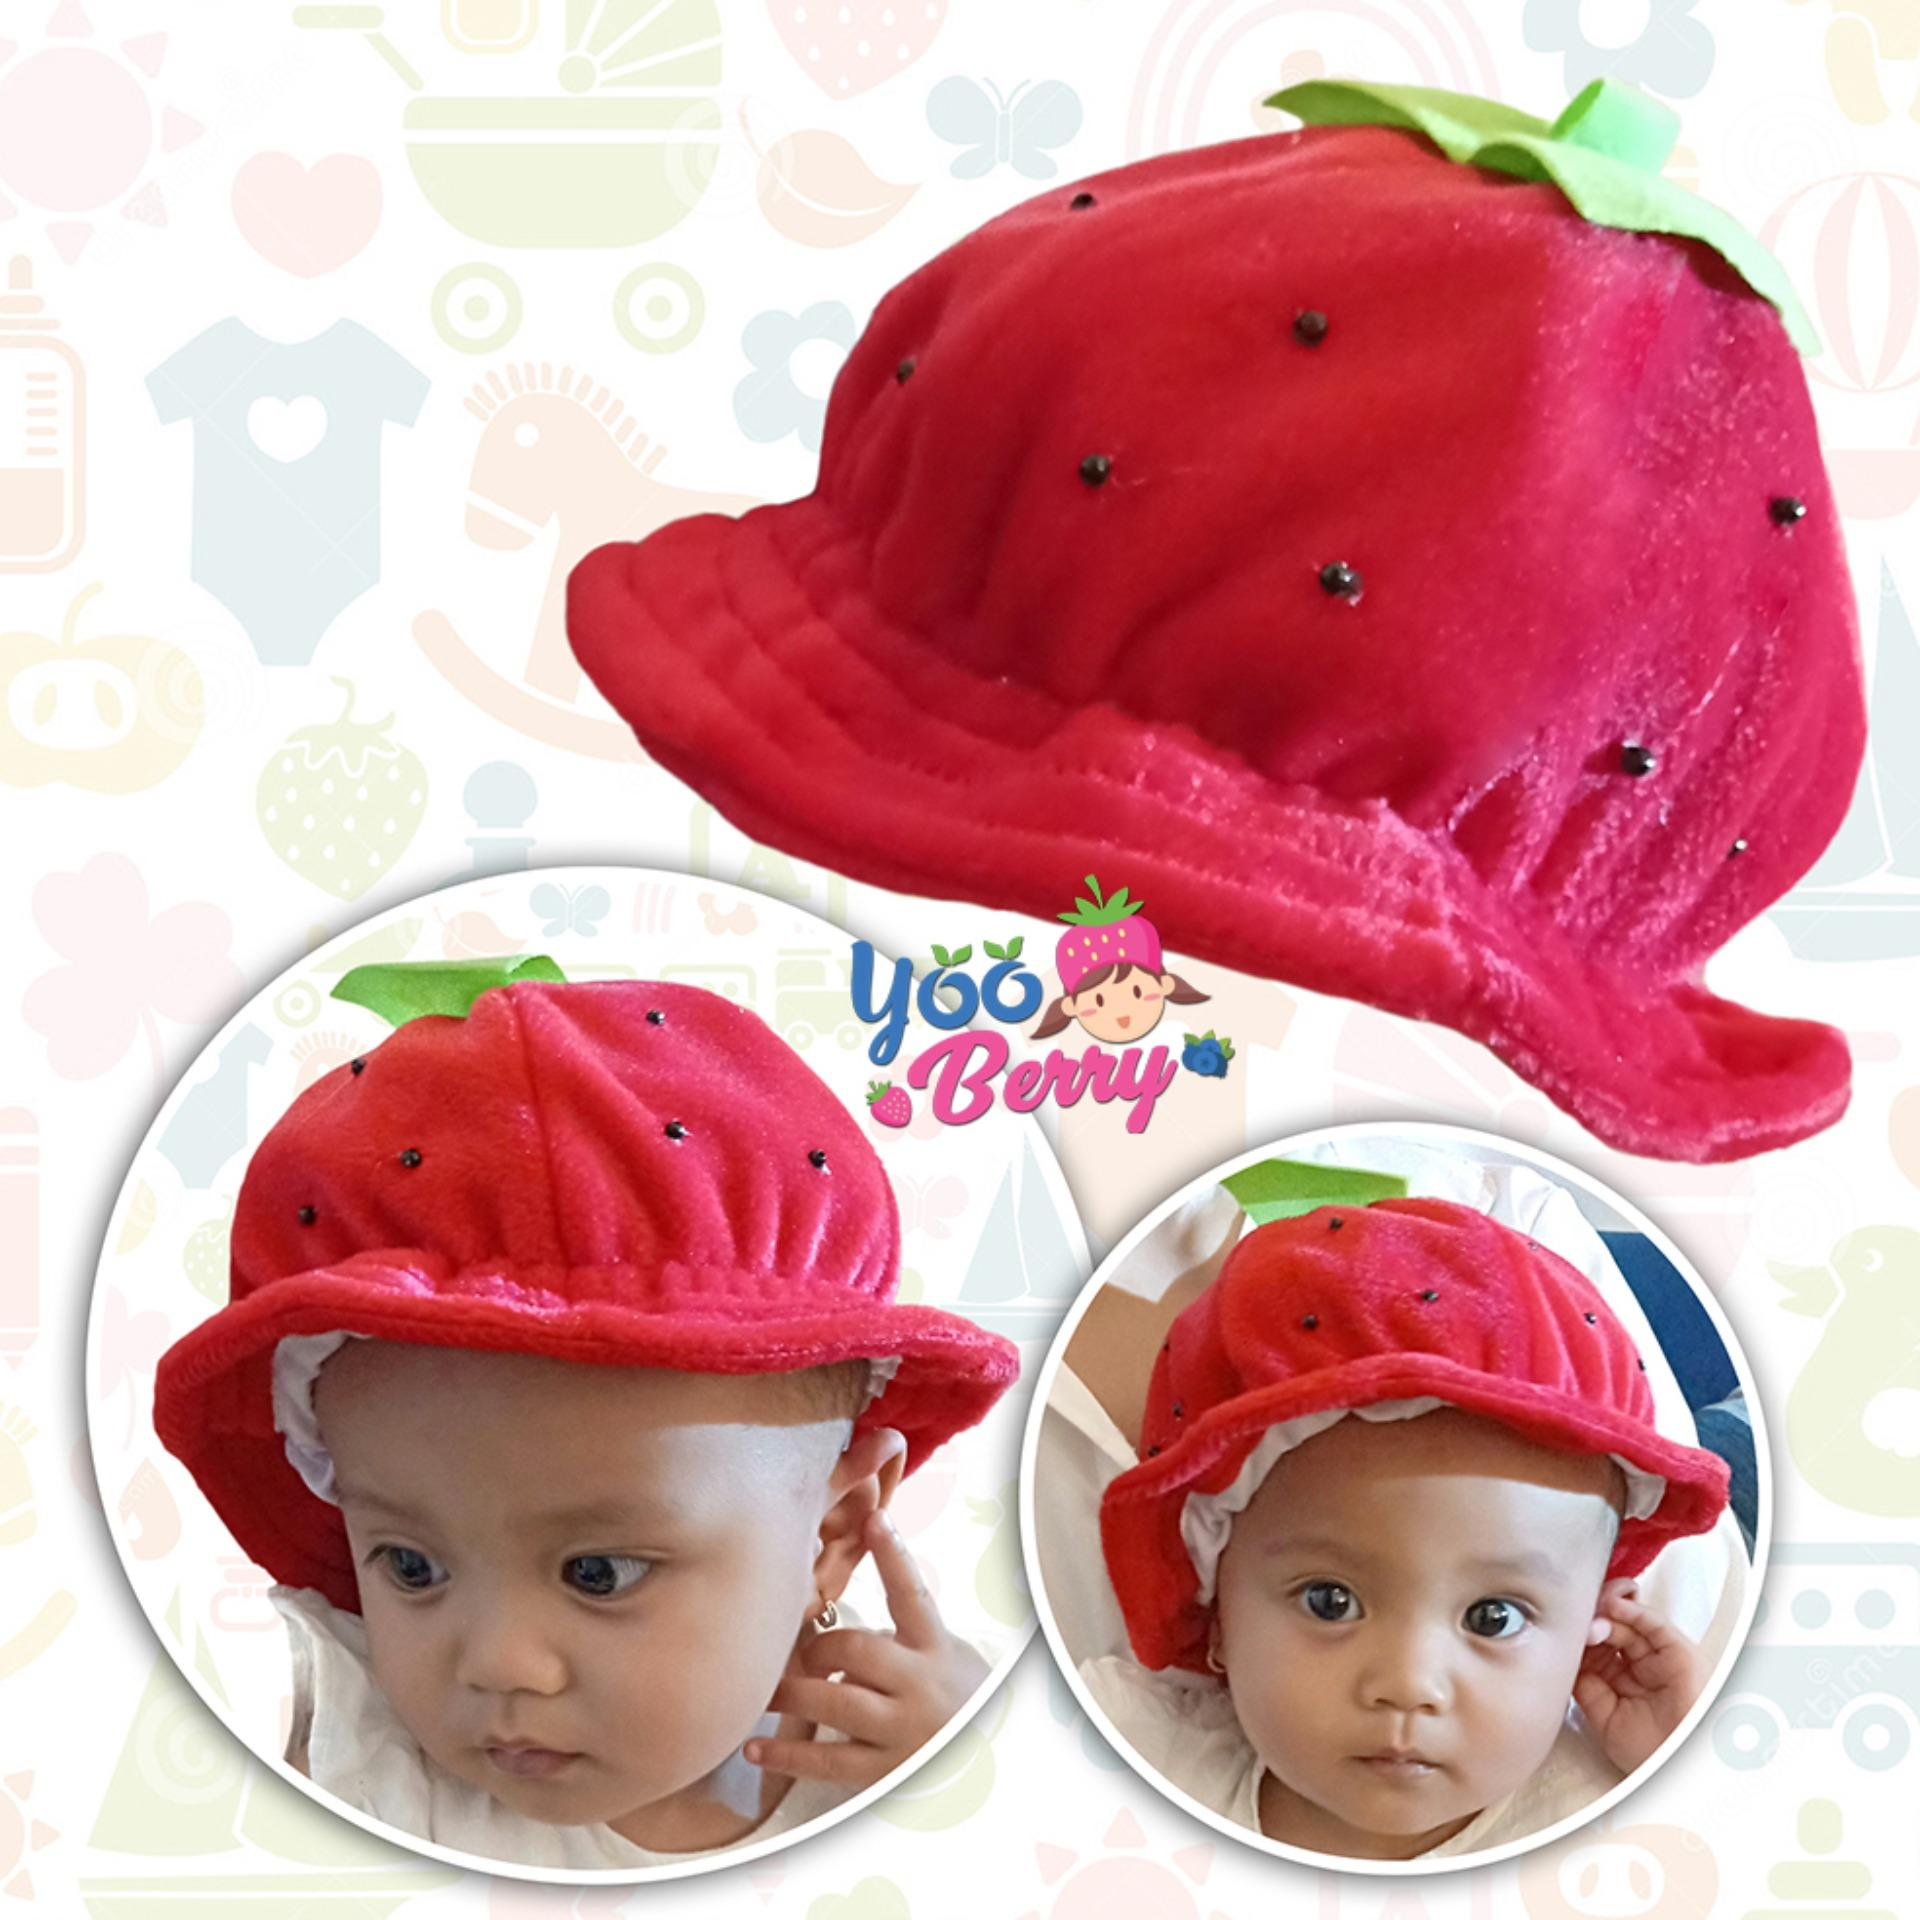 Yooberry Topi Korea Bayi Anak Pinky Strawberry By Yooberry.